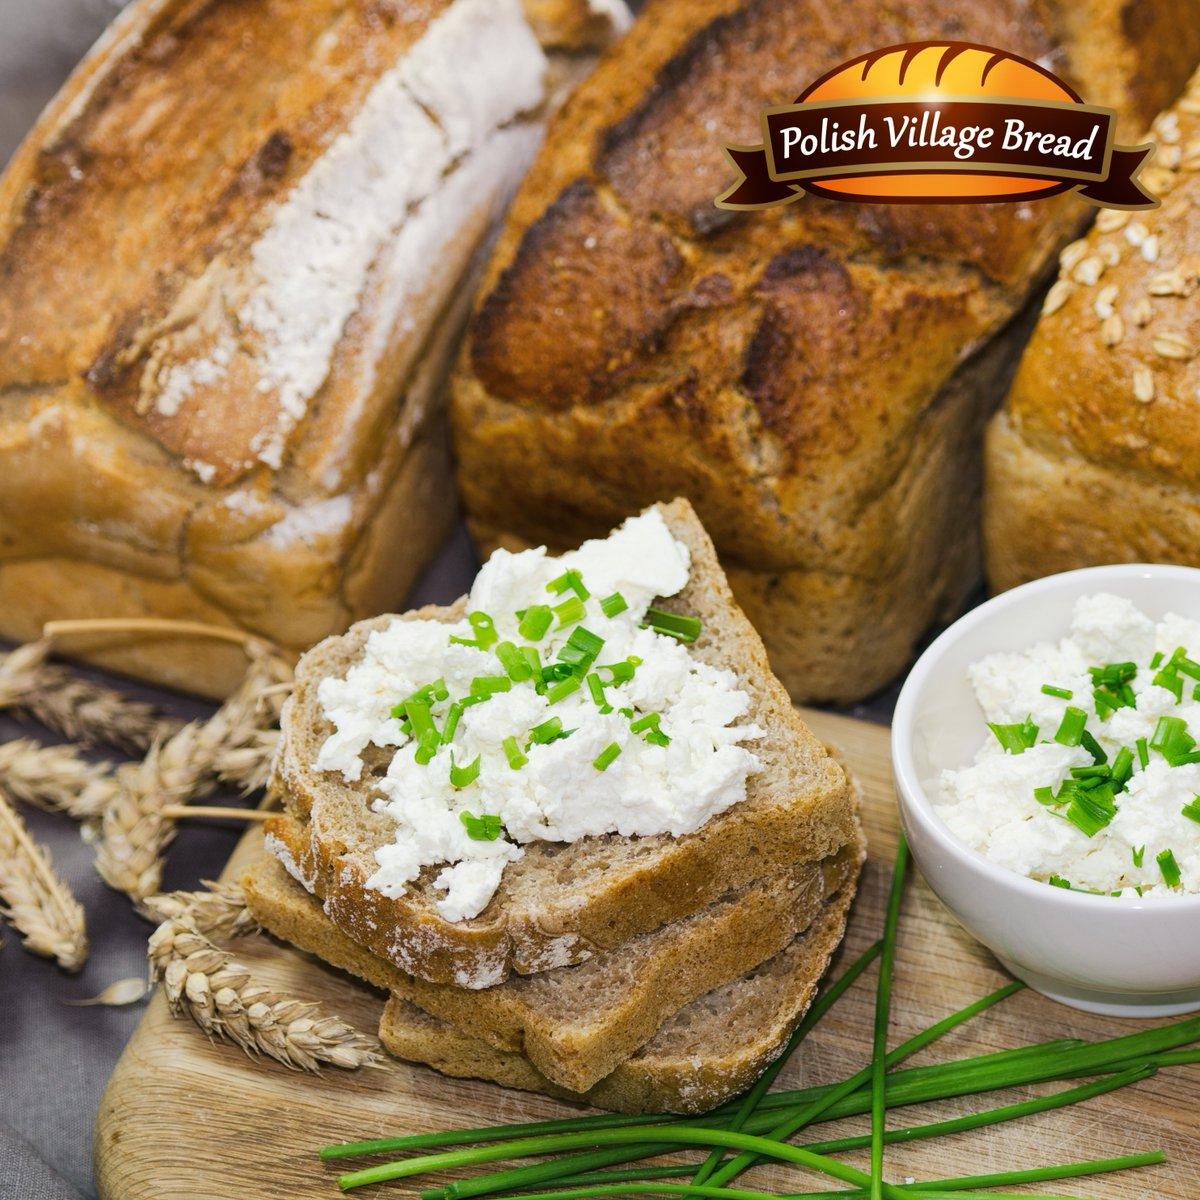 polish village bread ltd